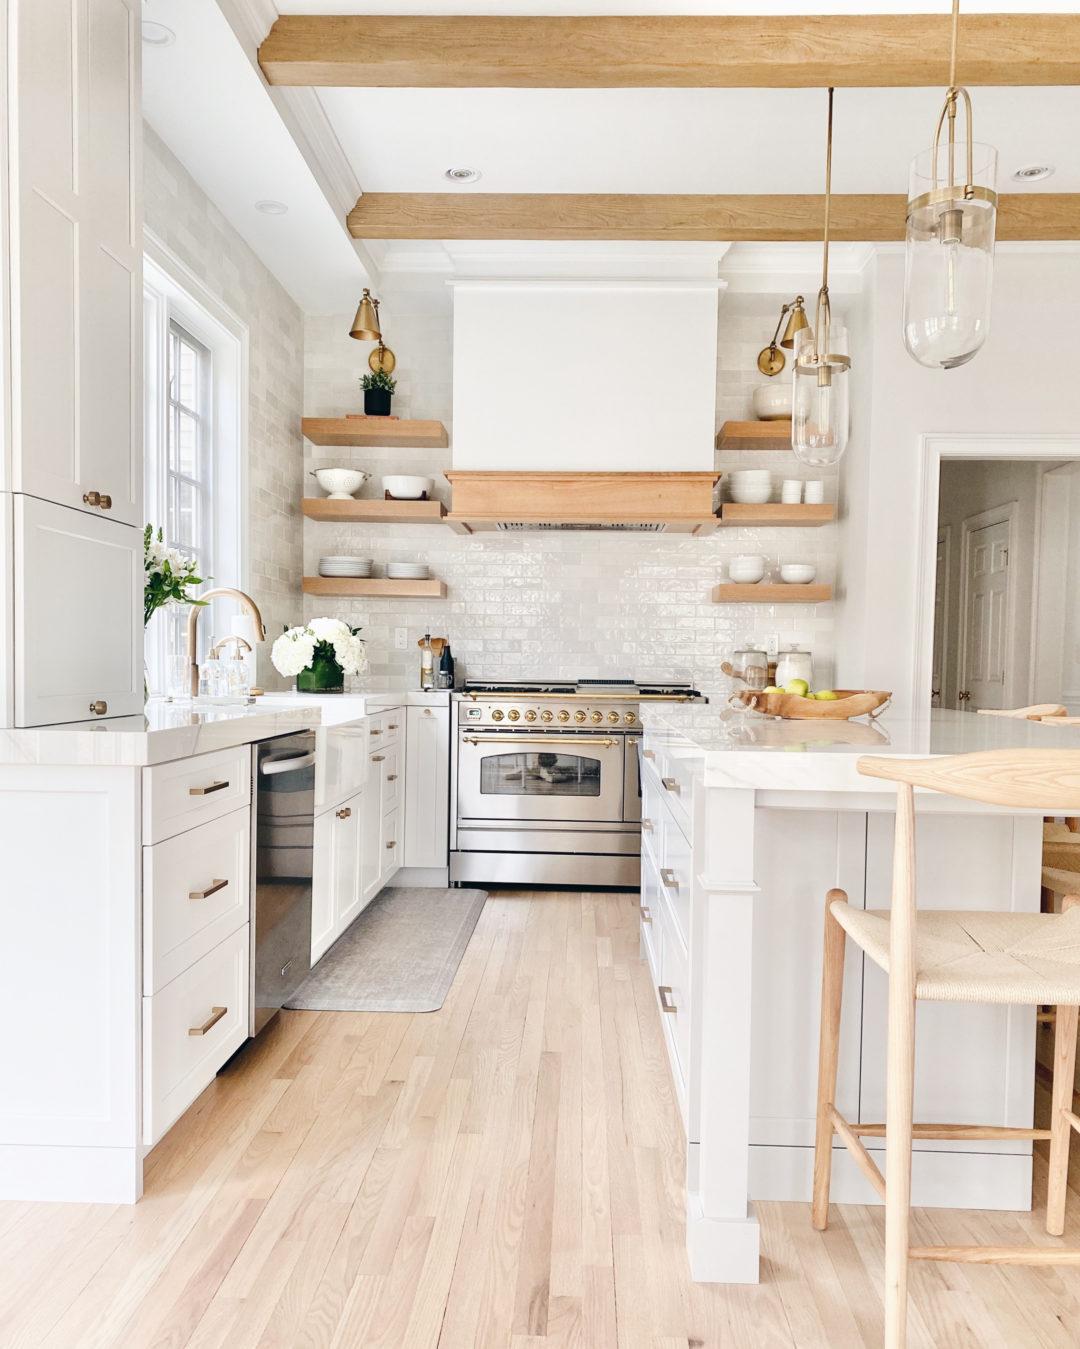 modern white kitchen with open shelving - pinteresting plans blog kitchen remodel